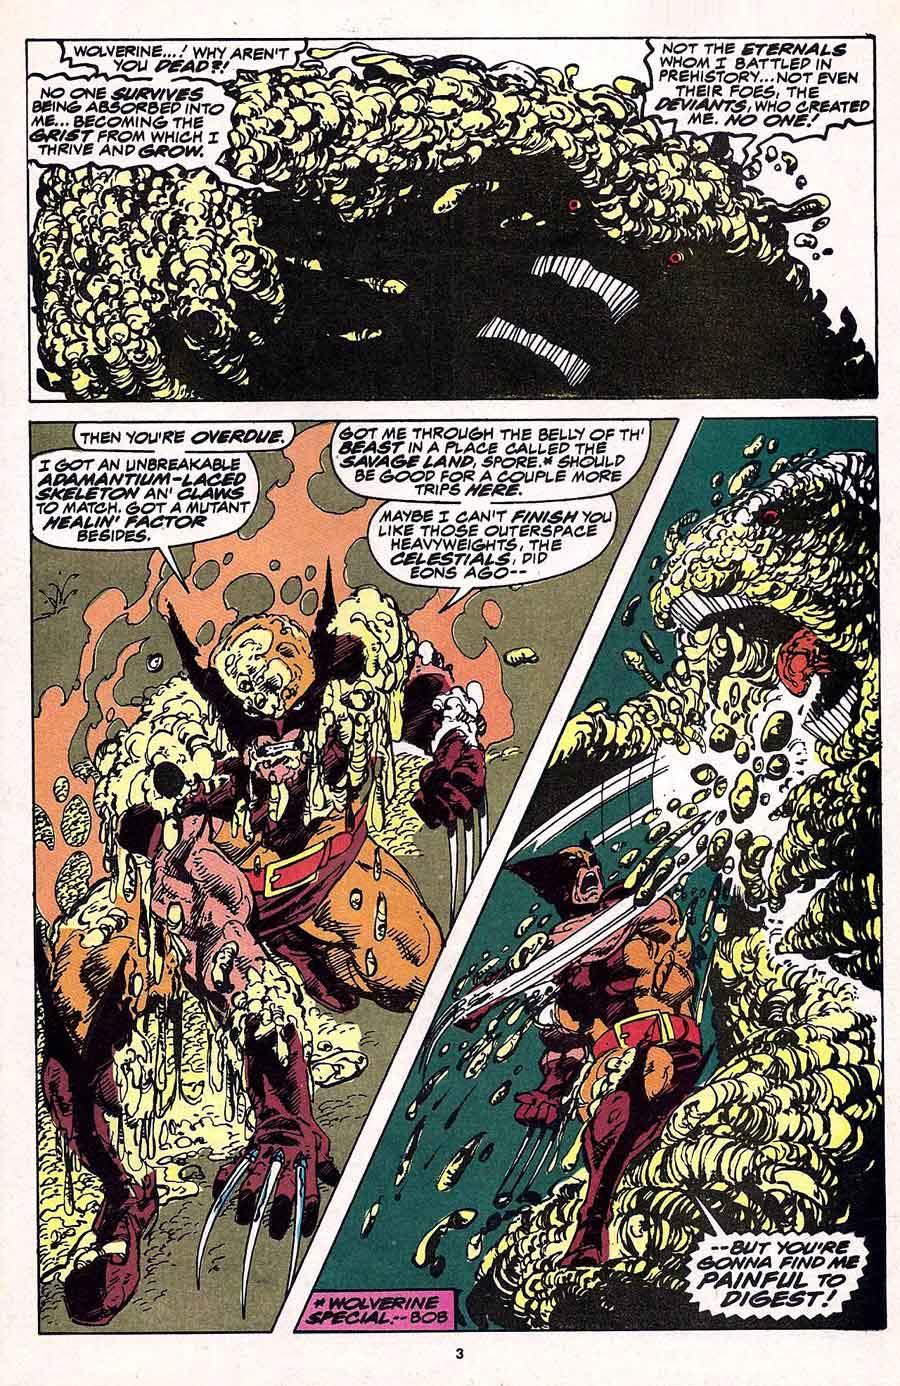 Wolverine v2 #23 marvel 1990s comic book page art by John Byrne